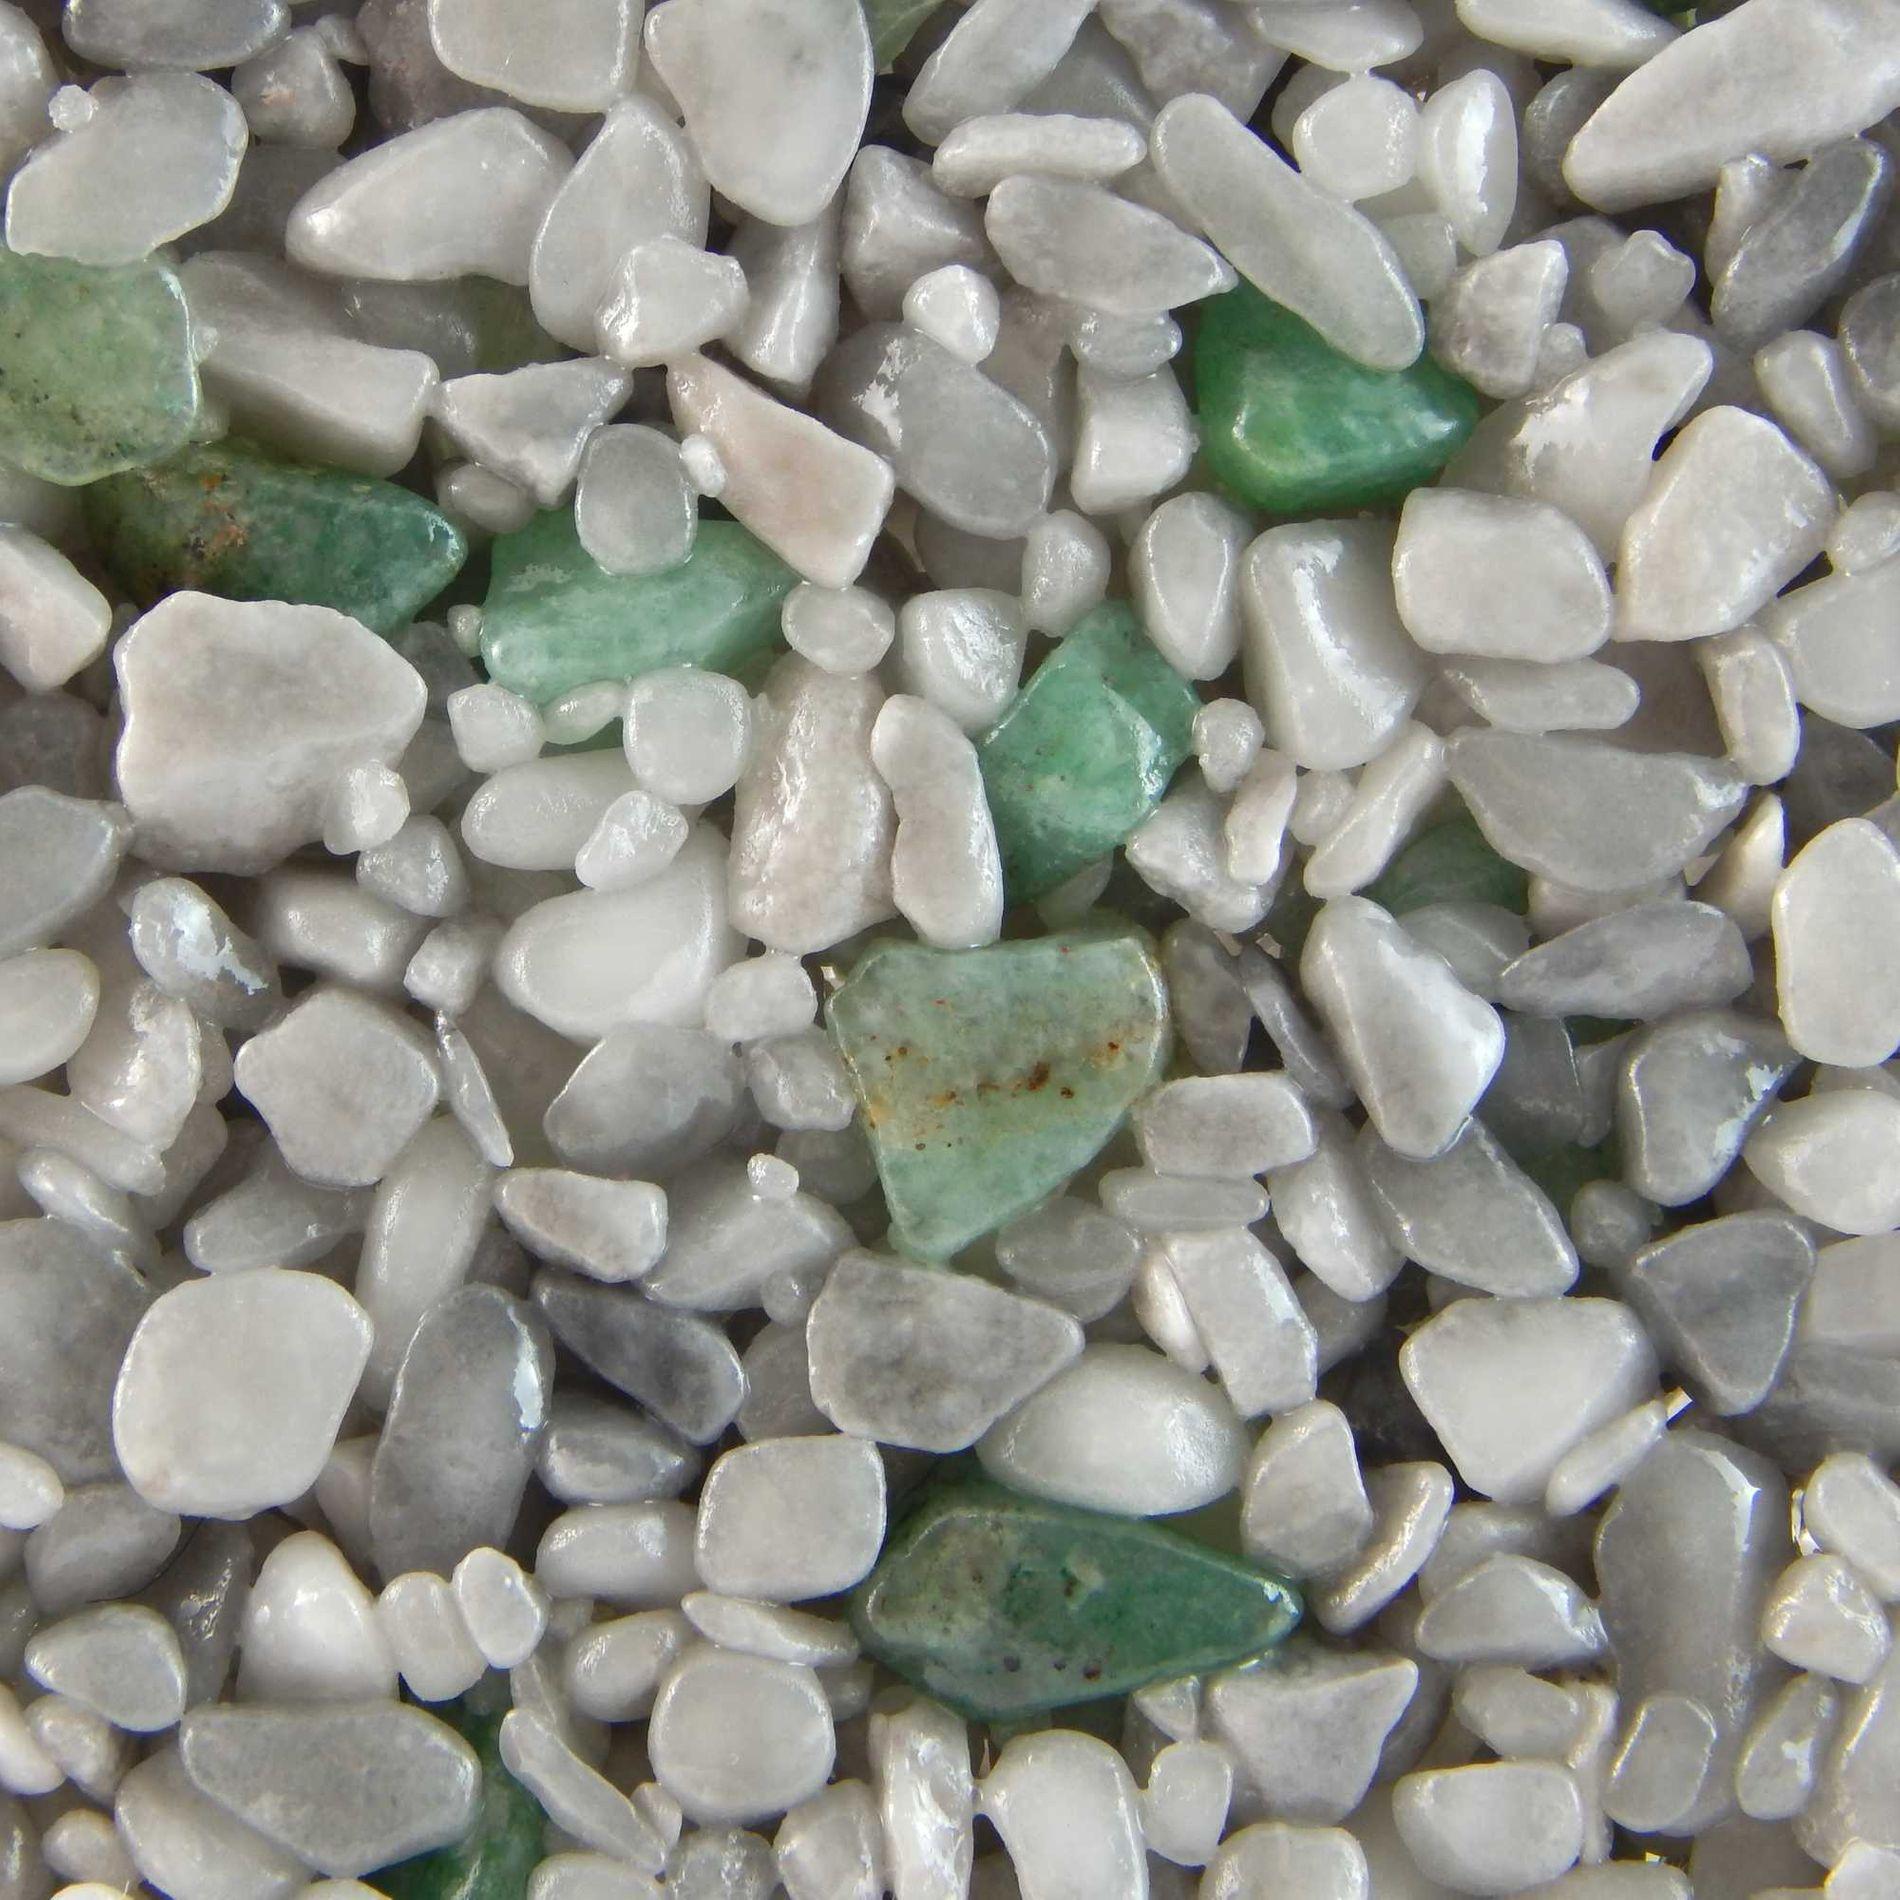 Terralith Edelsteinteppich Mix Aventurin / Grau 1 qm -innen-